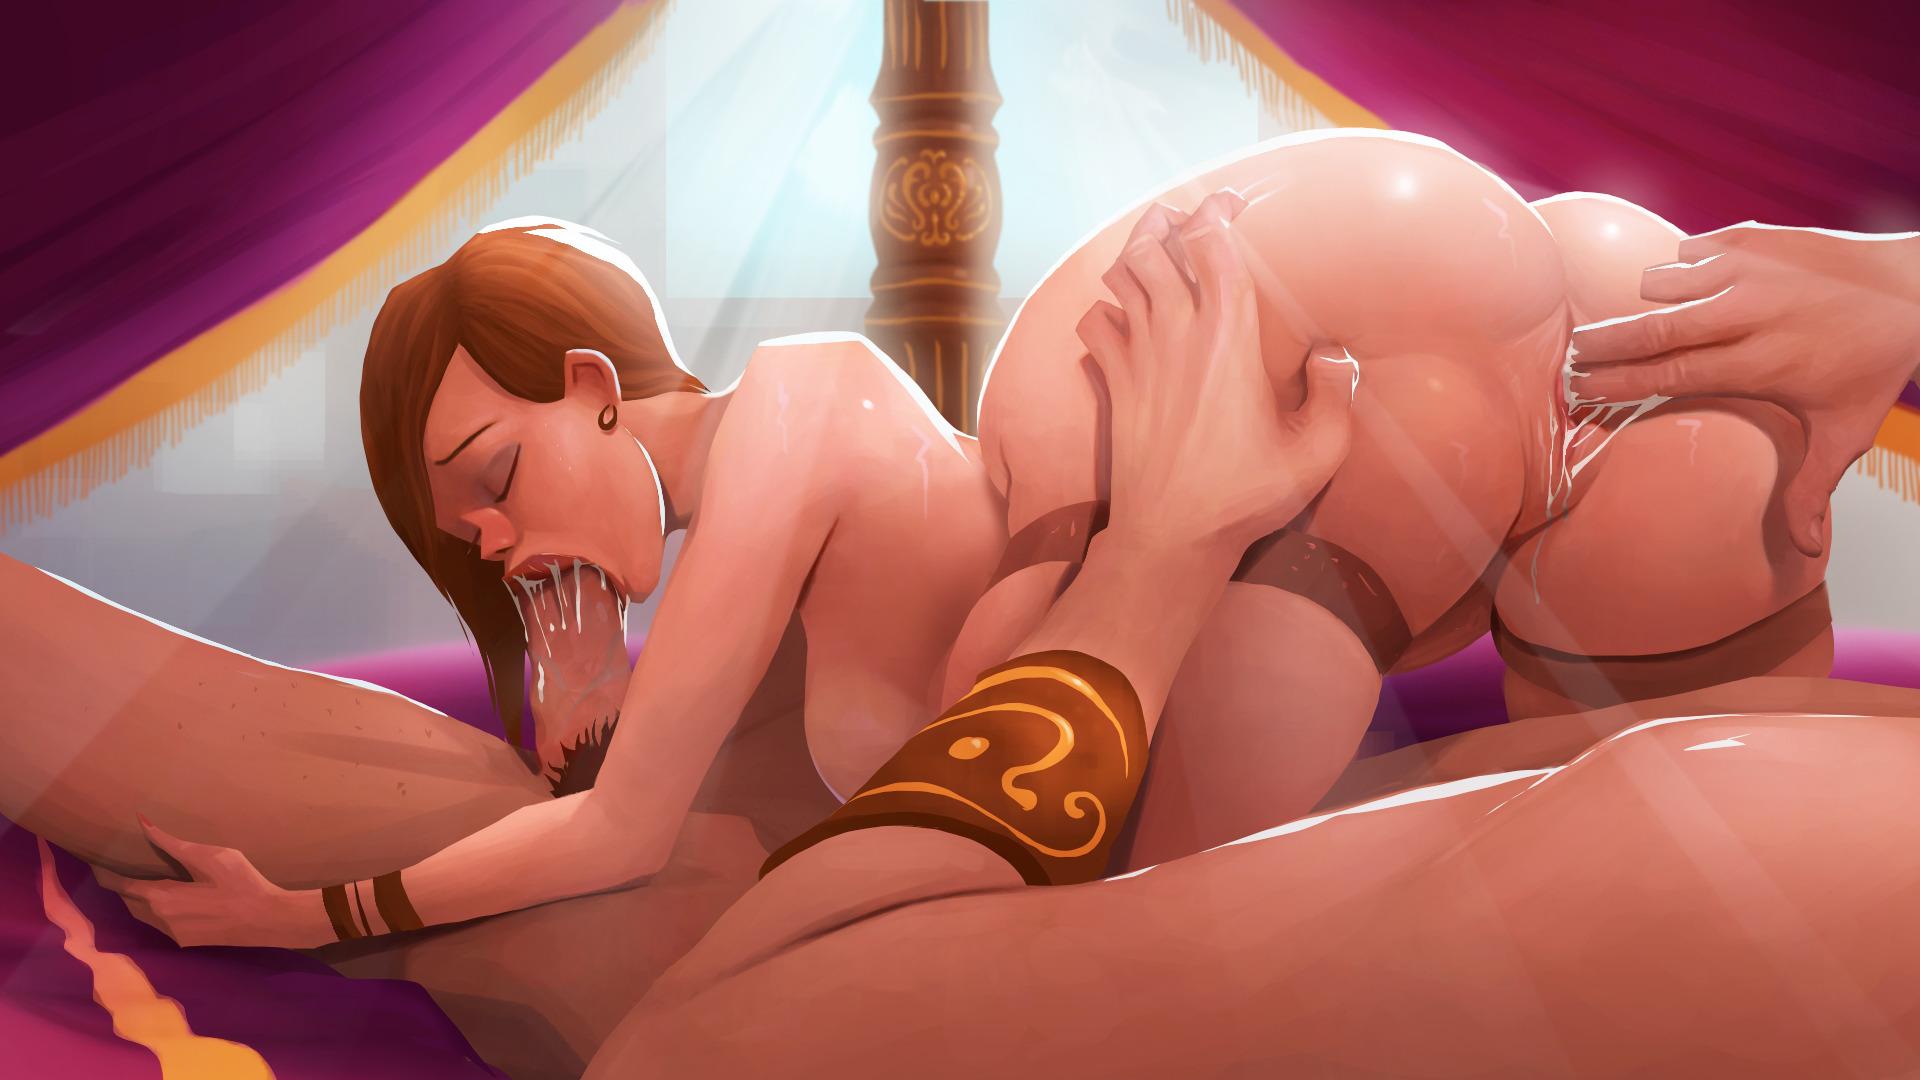 Kingdoms of Lust porn comics 8 muses